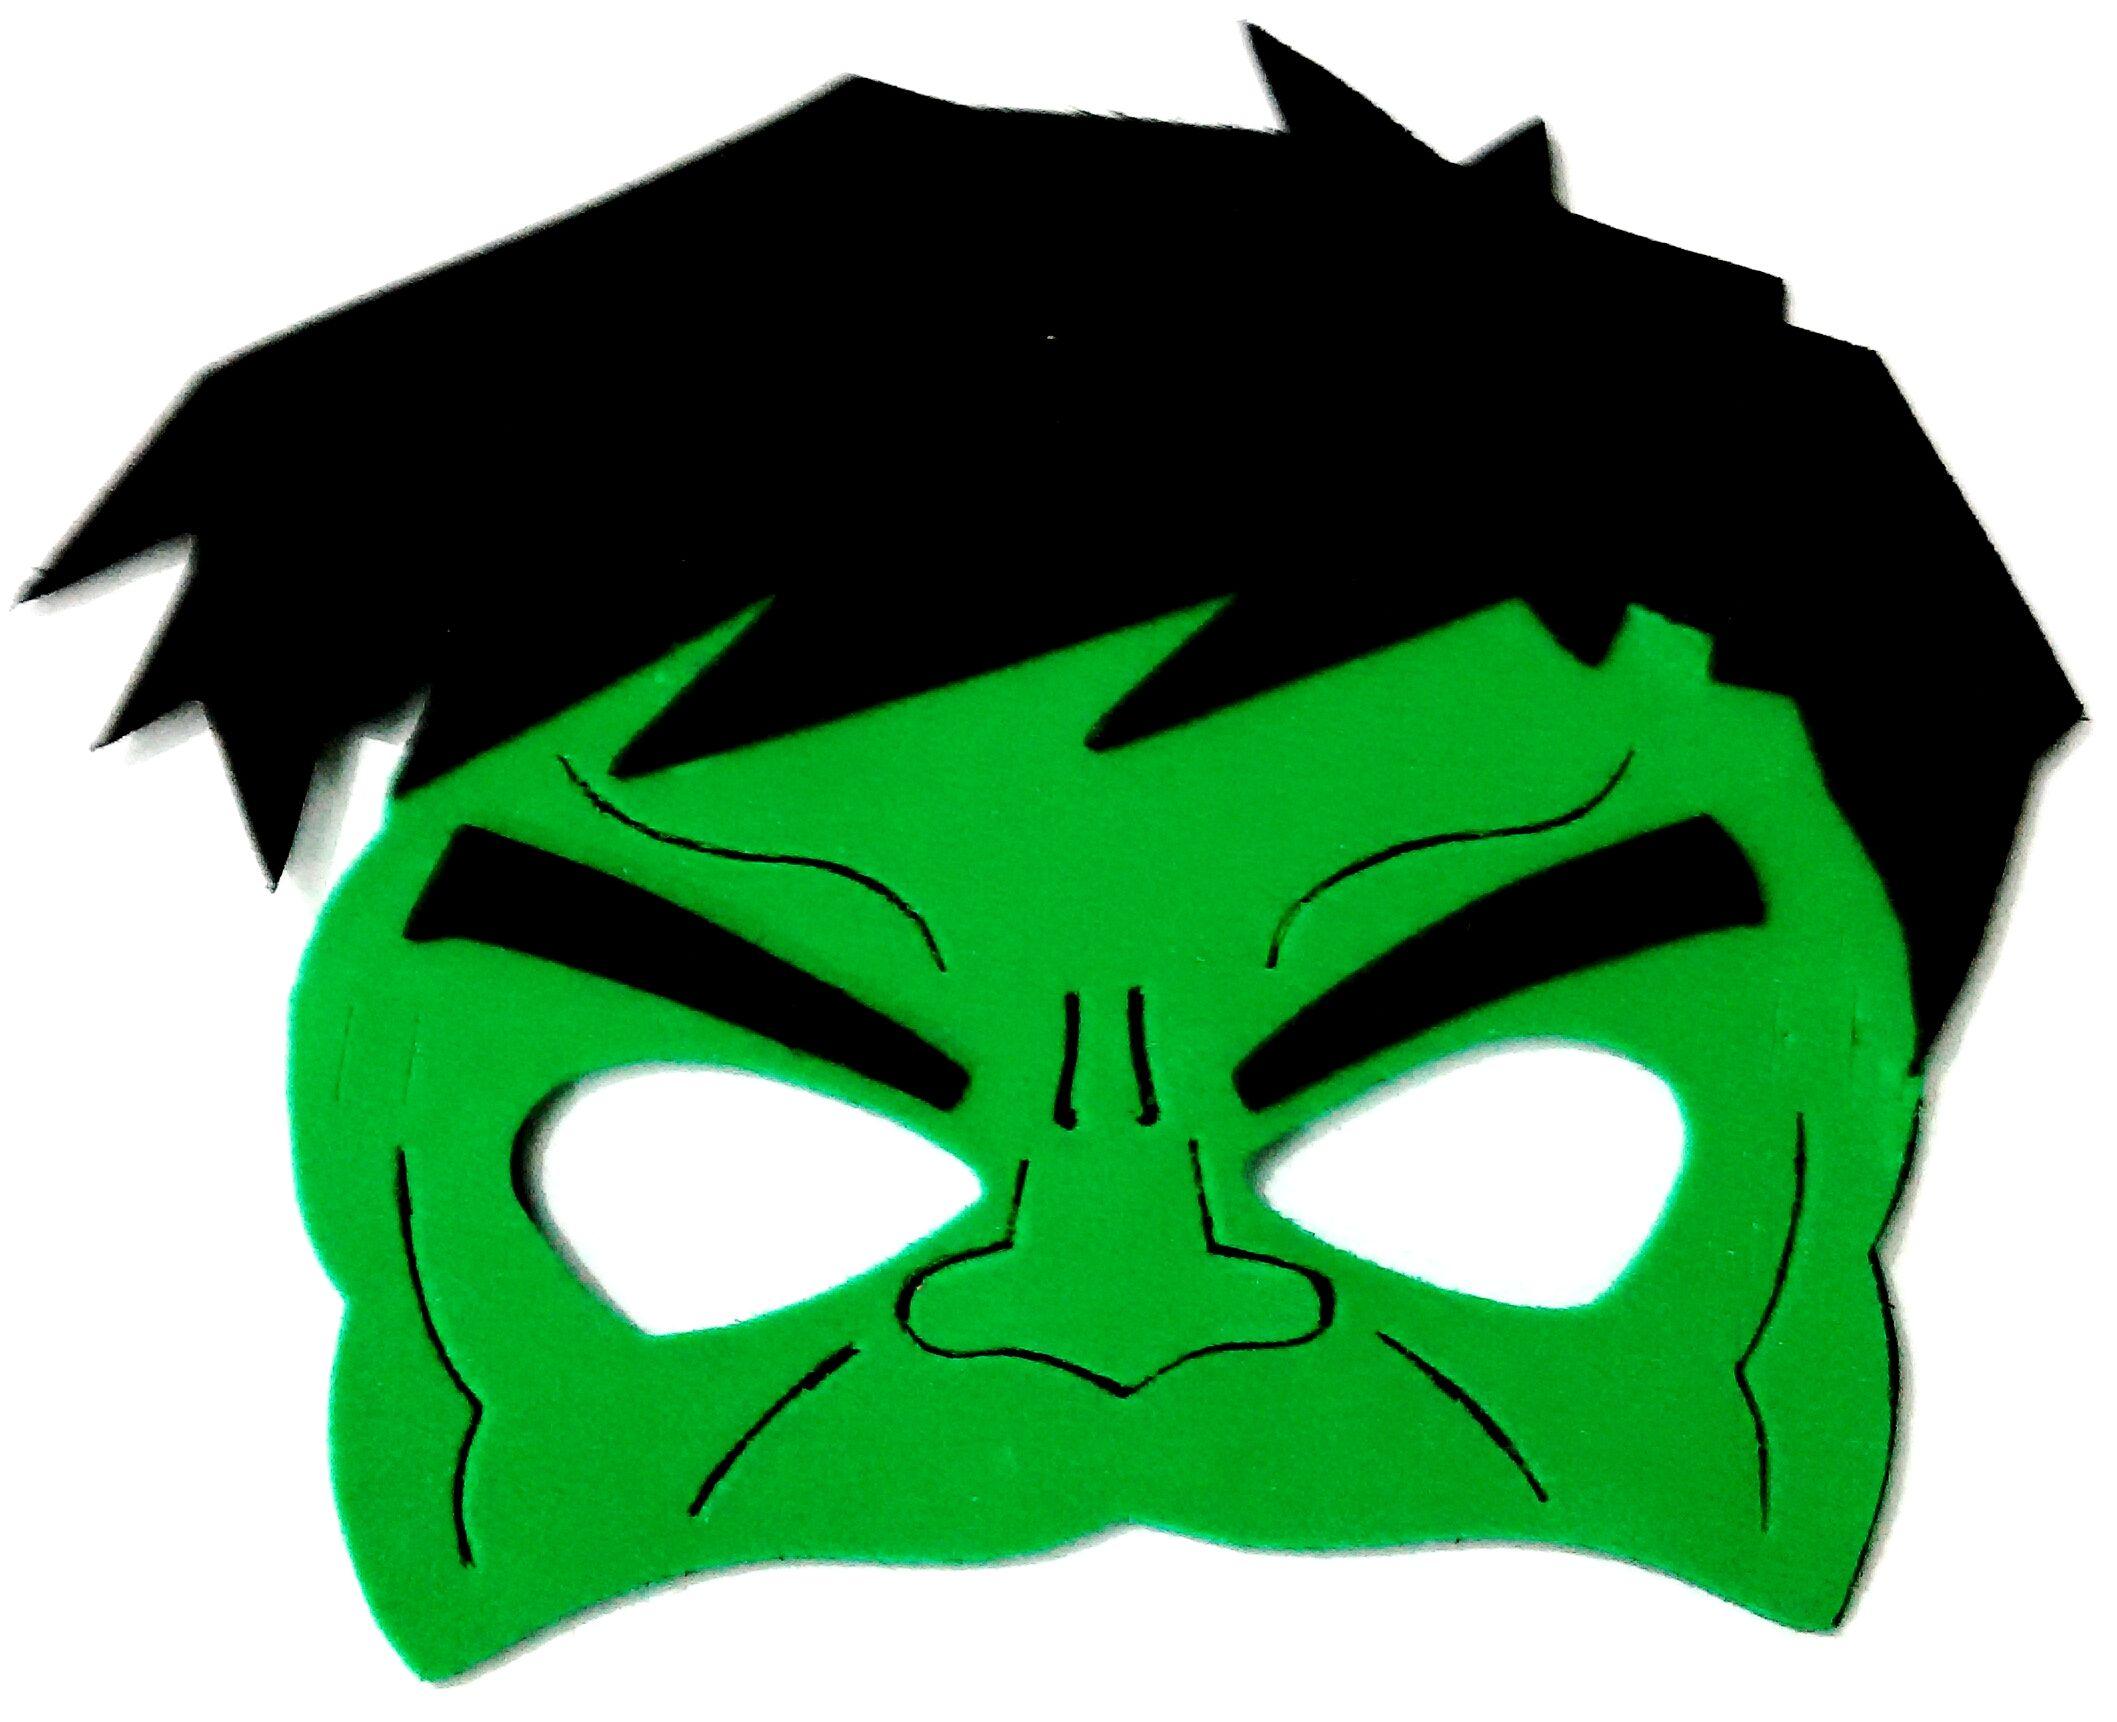 Mascara Eva Hulk Super Herois 30 Pcs R 57 00 Pinatas De Hulk Mascaras De Superheroes Mascara De Hulk